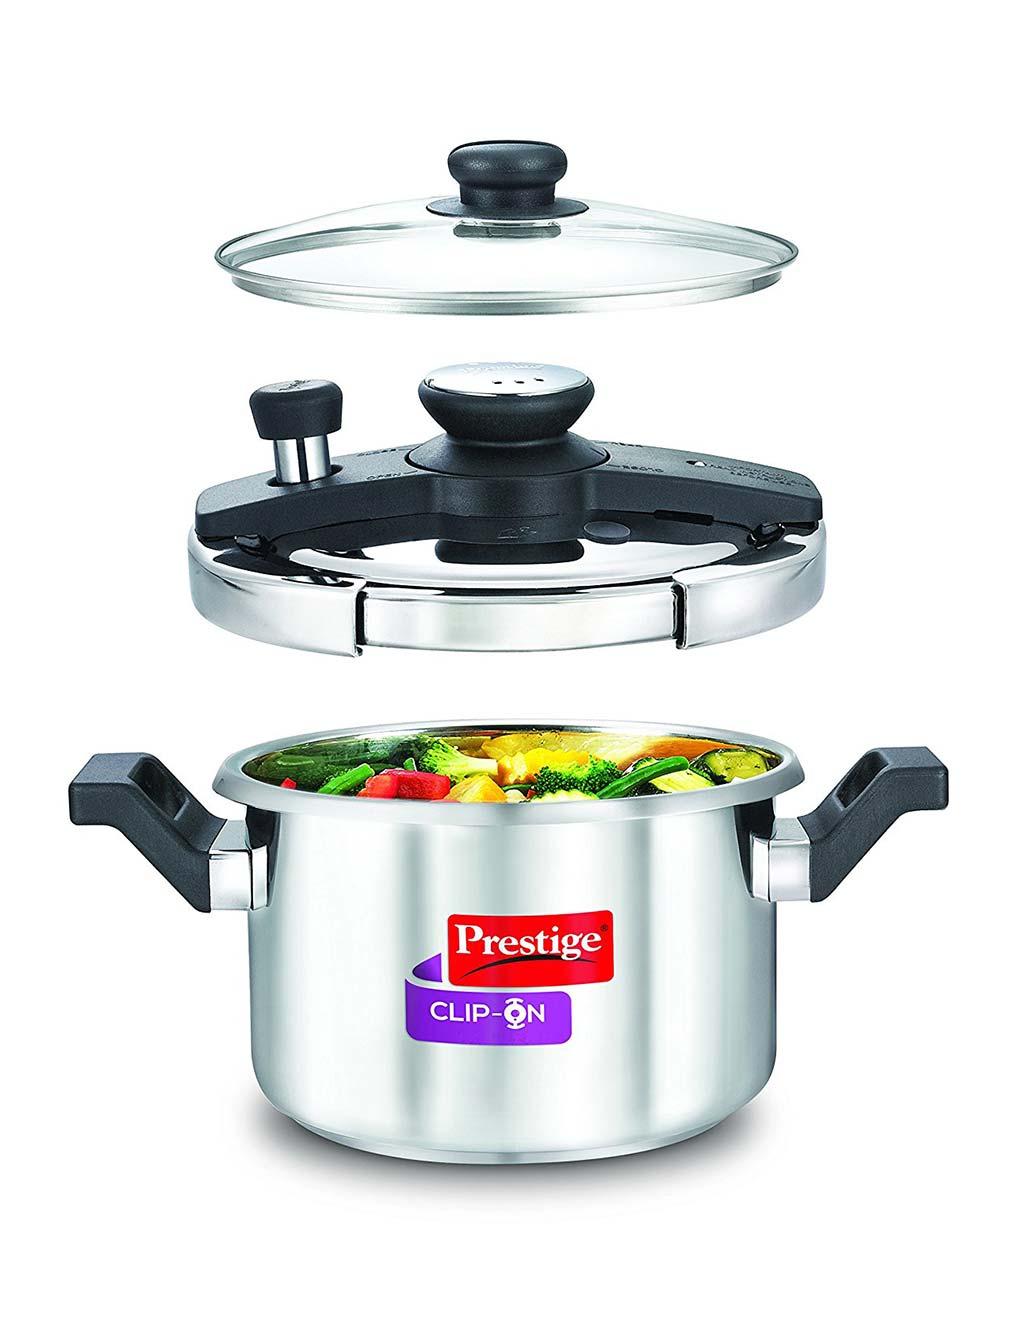 3lt. Clip On Pressure Cooker by Prestige| EZMall